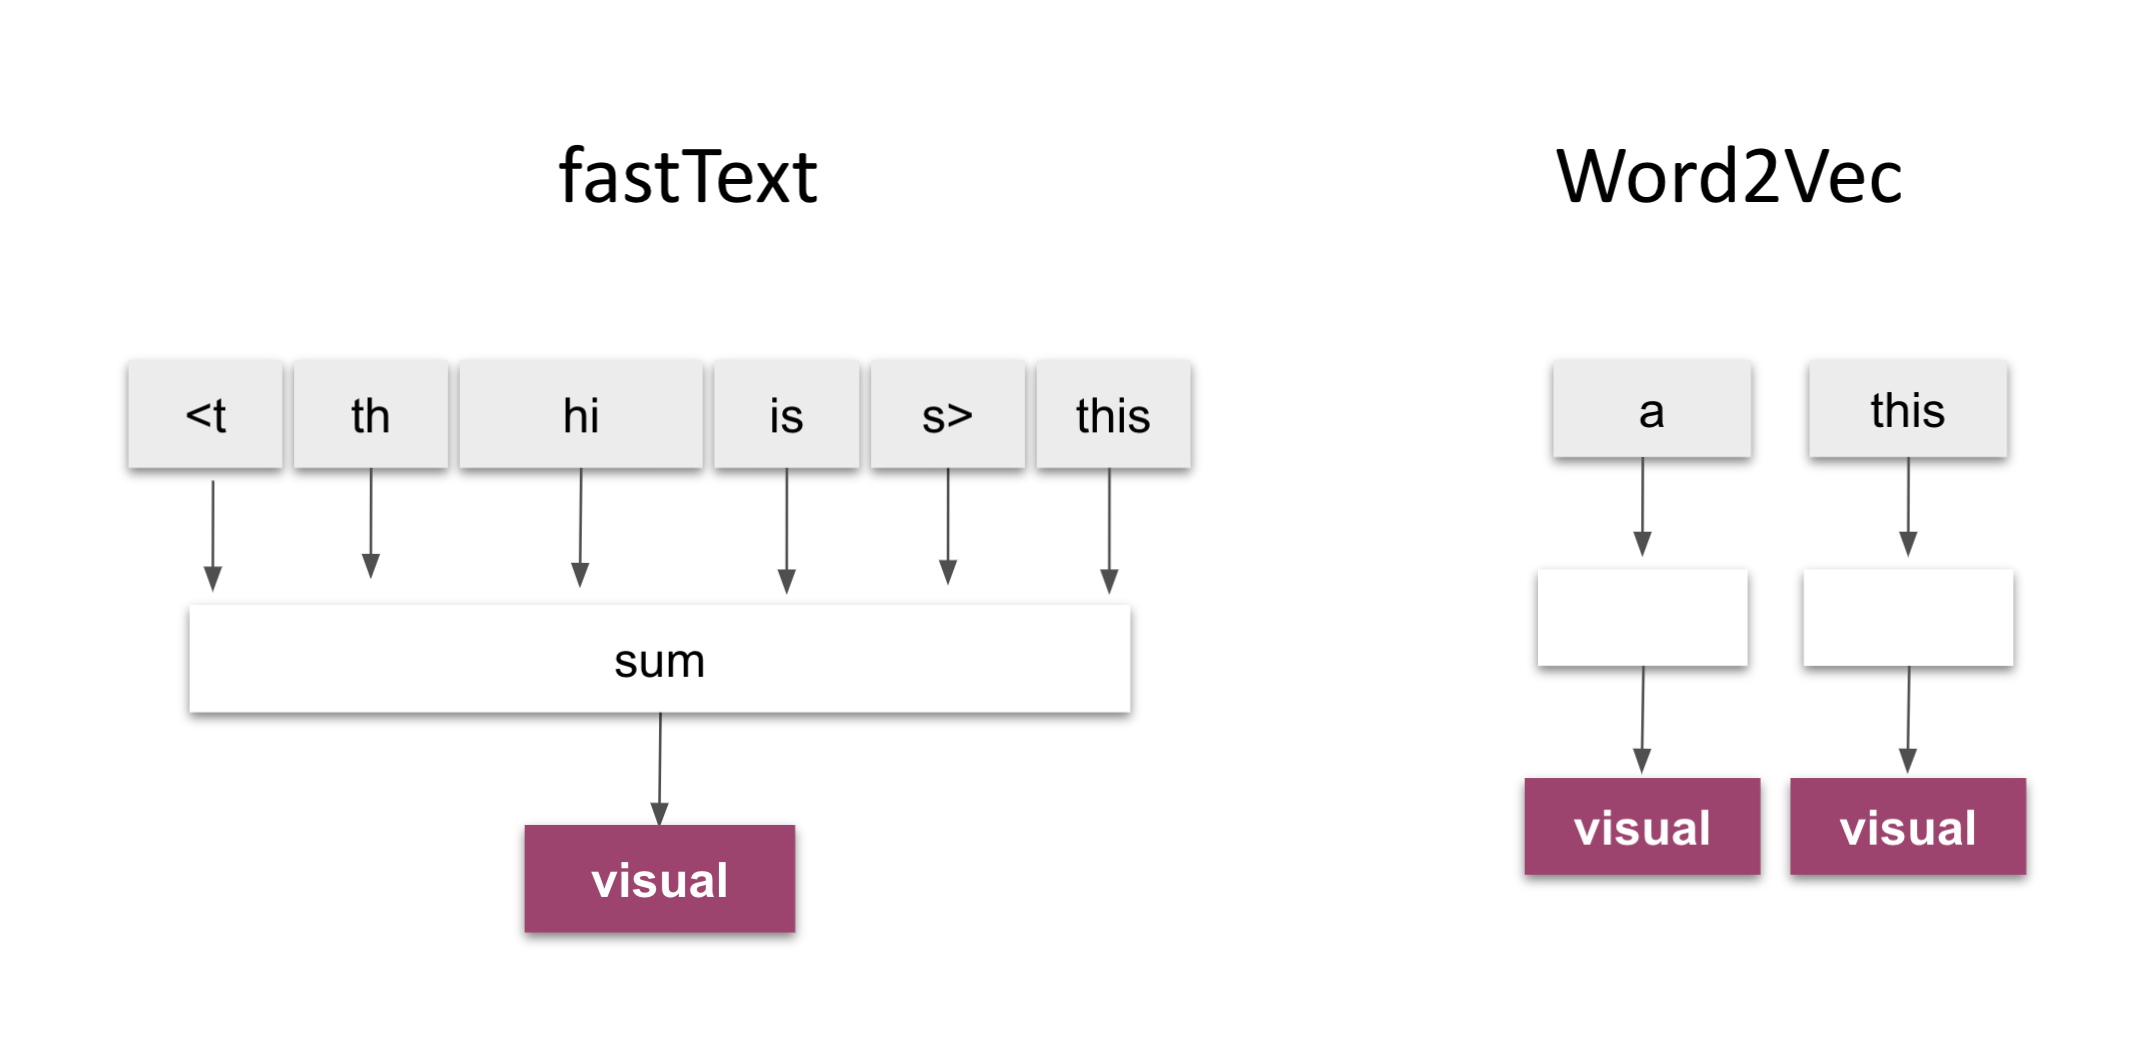 fastText vs. Word2Vec